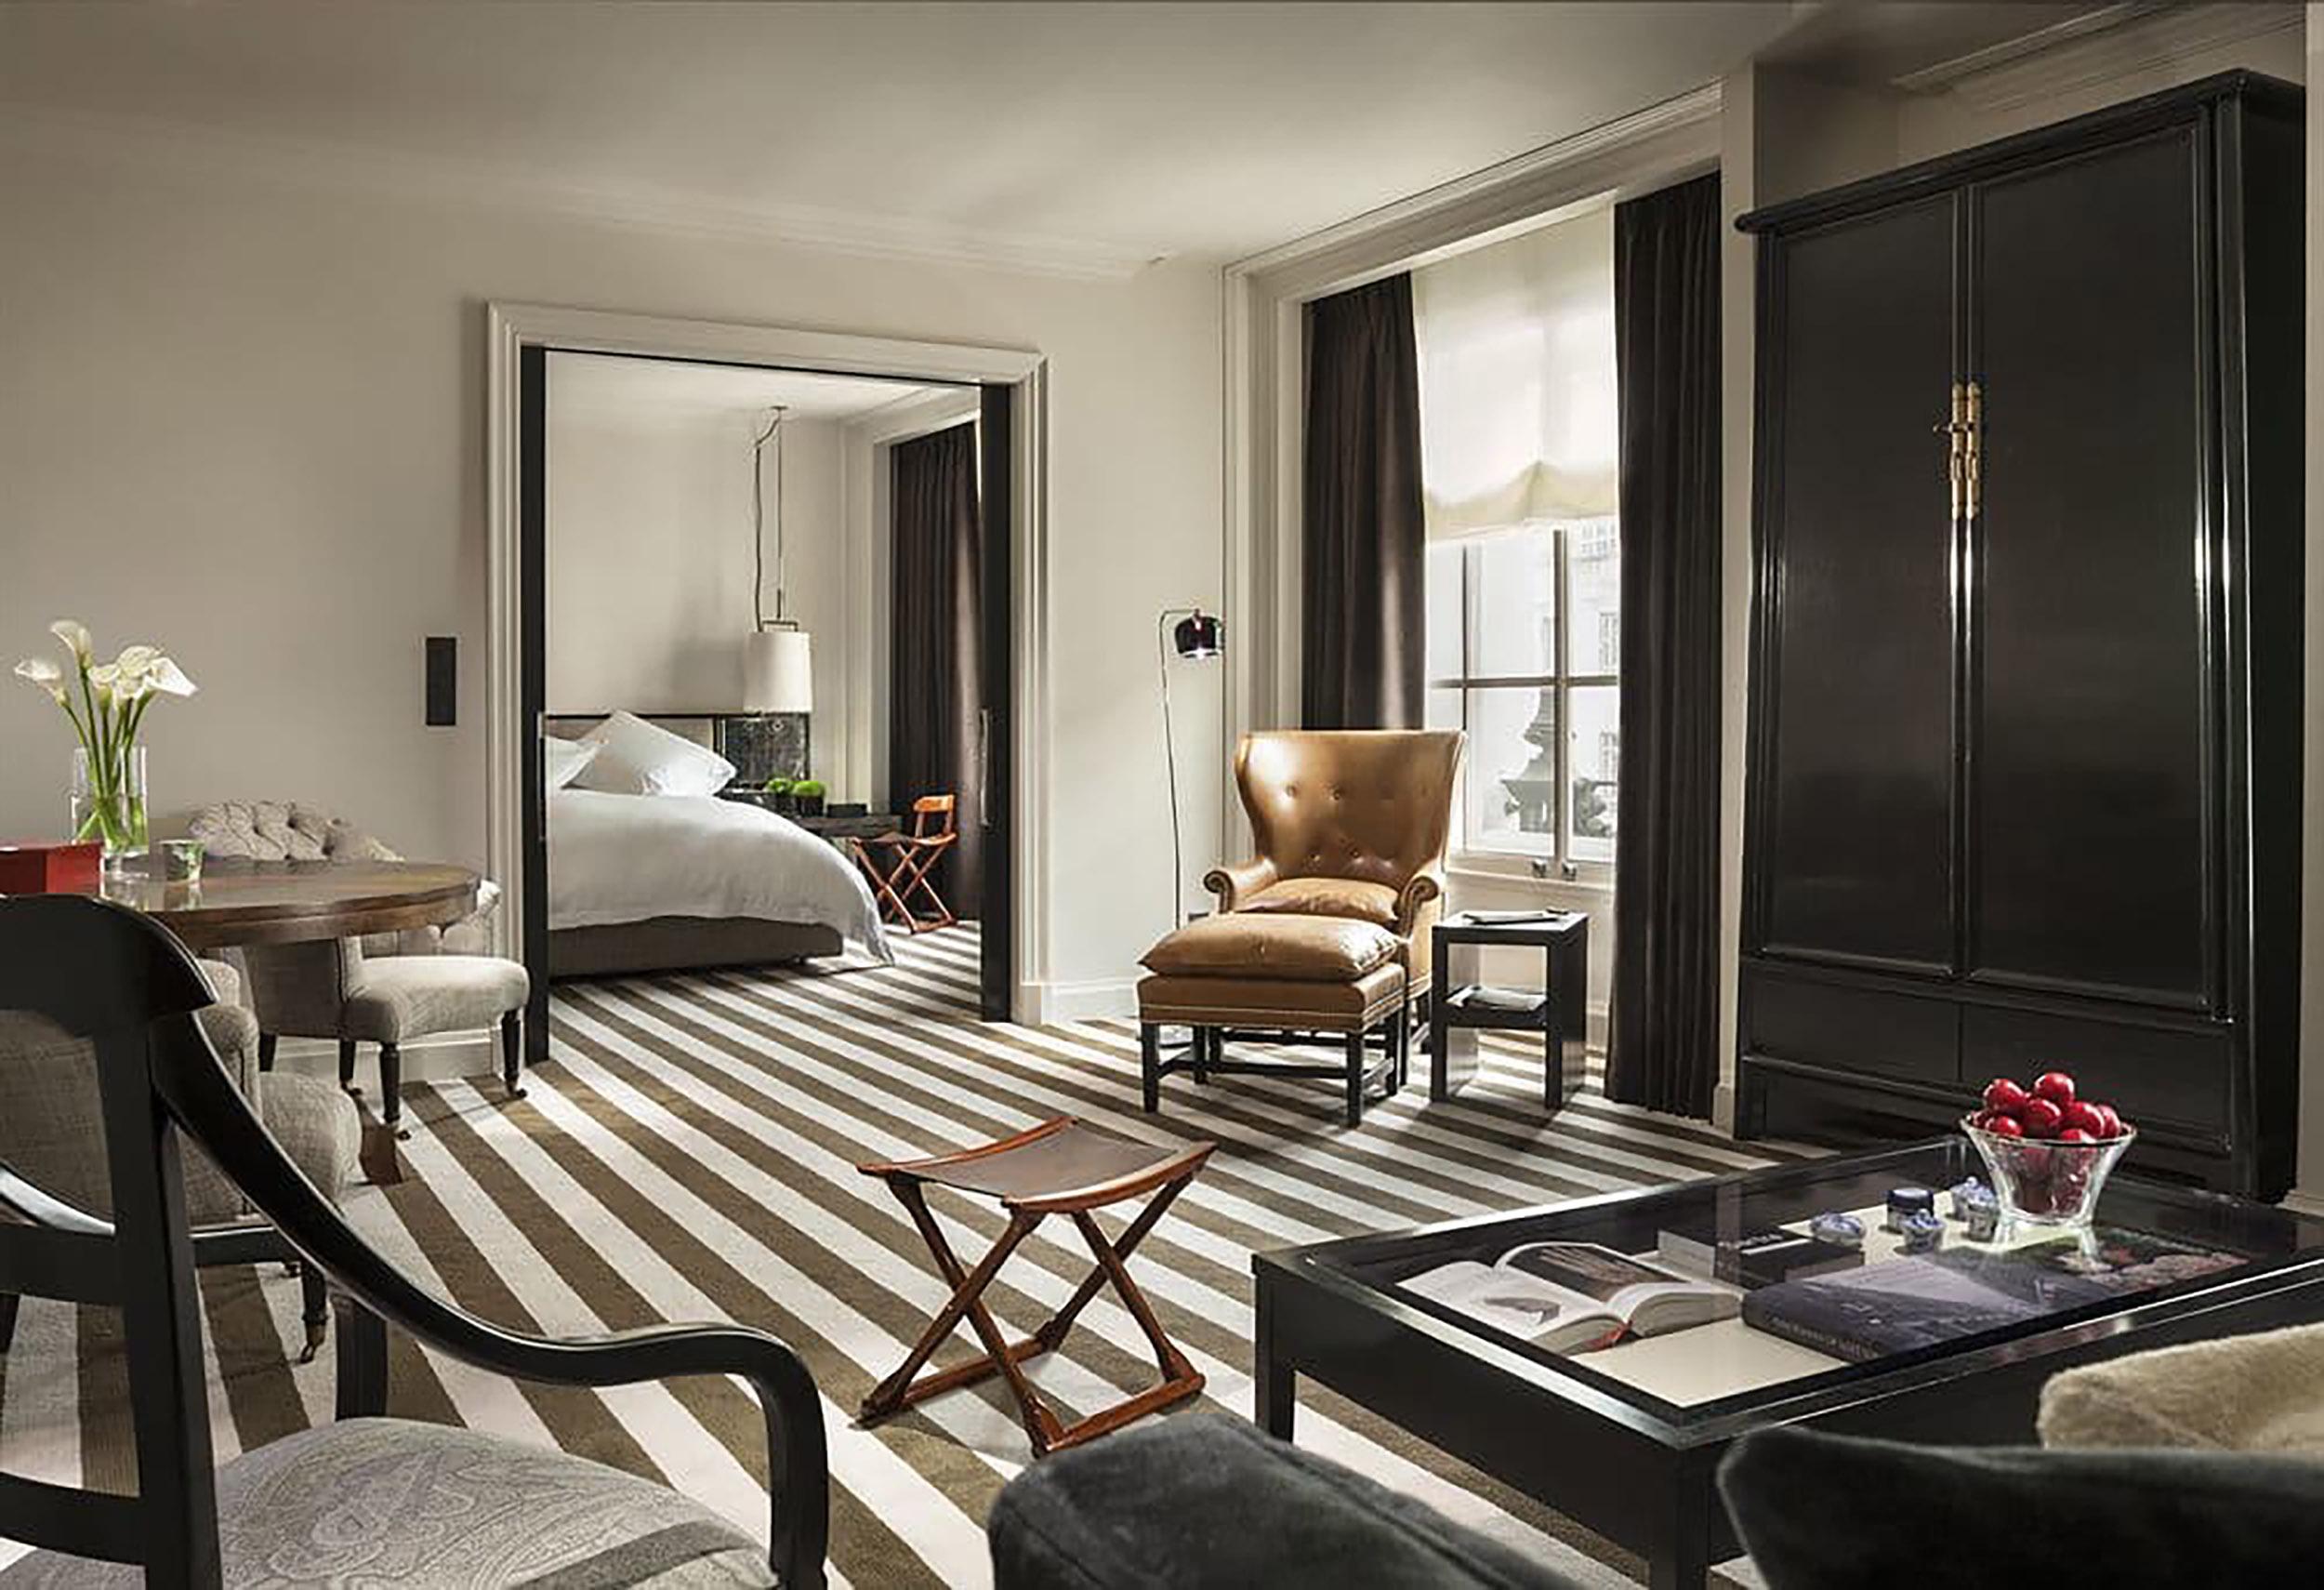 ....bespoke furniture   rosewood london : splay leg cabinet..特别定制家具   瑰丽伦敦酒店:大柜....